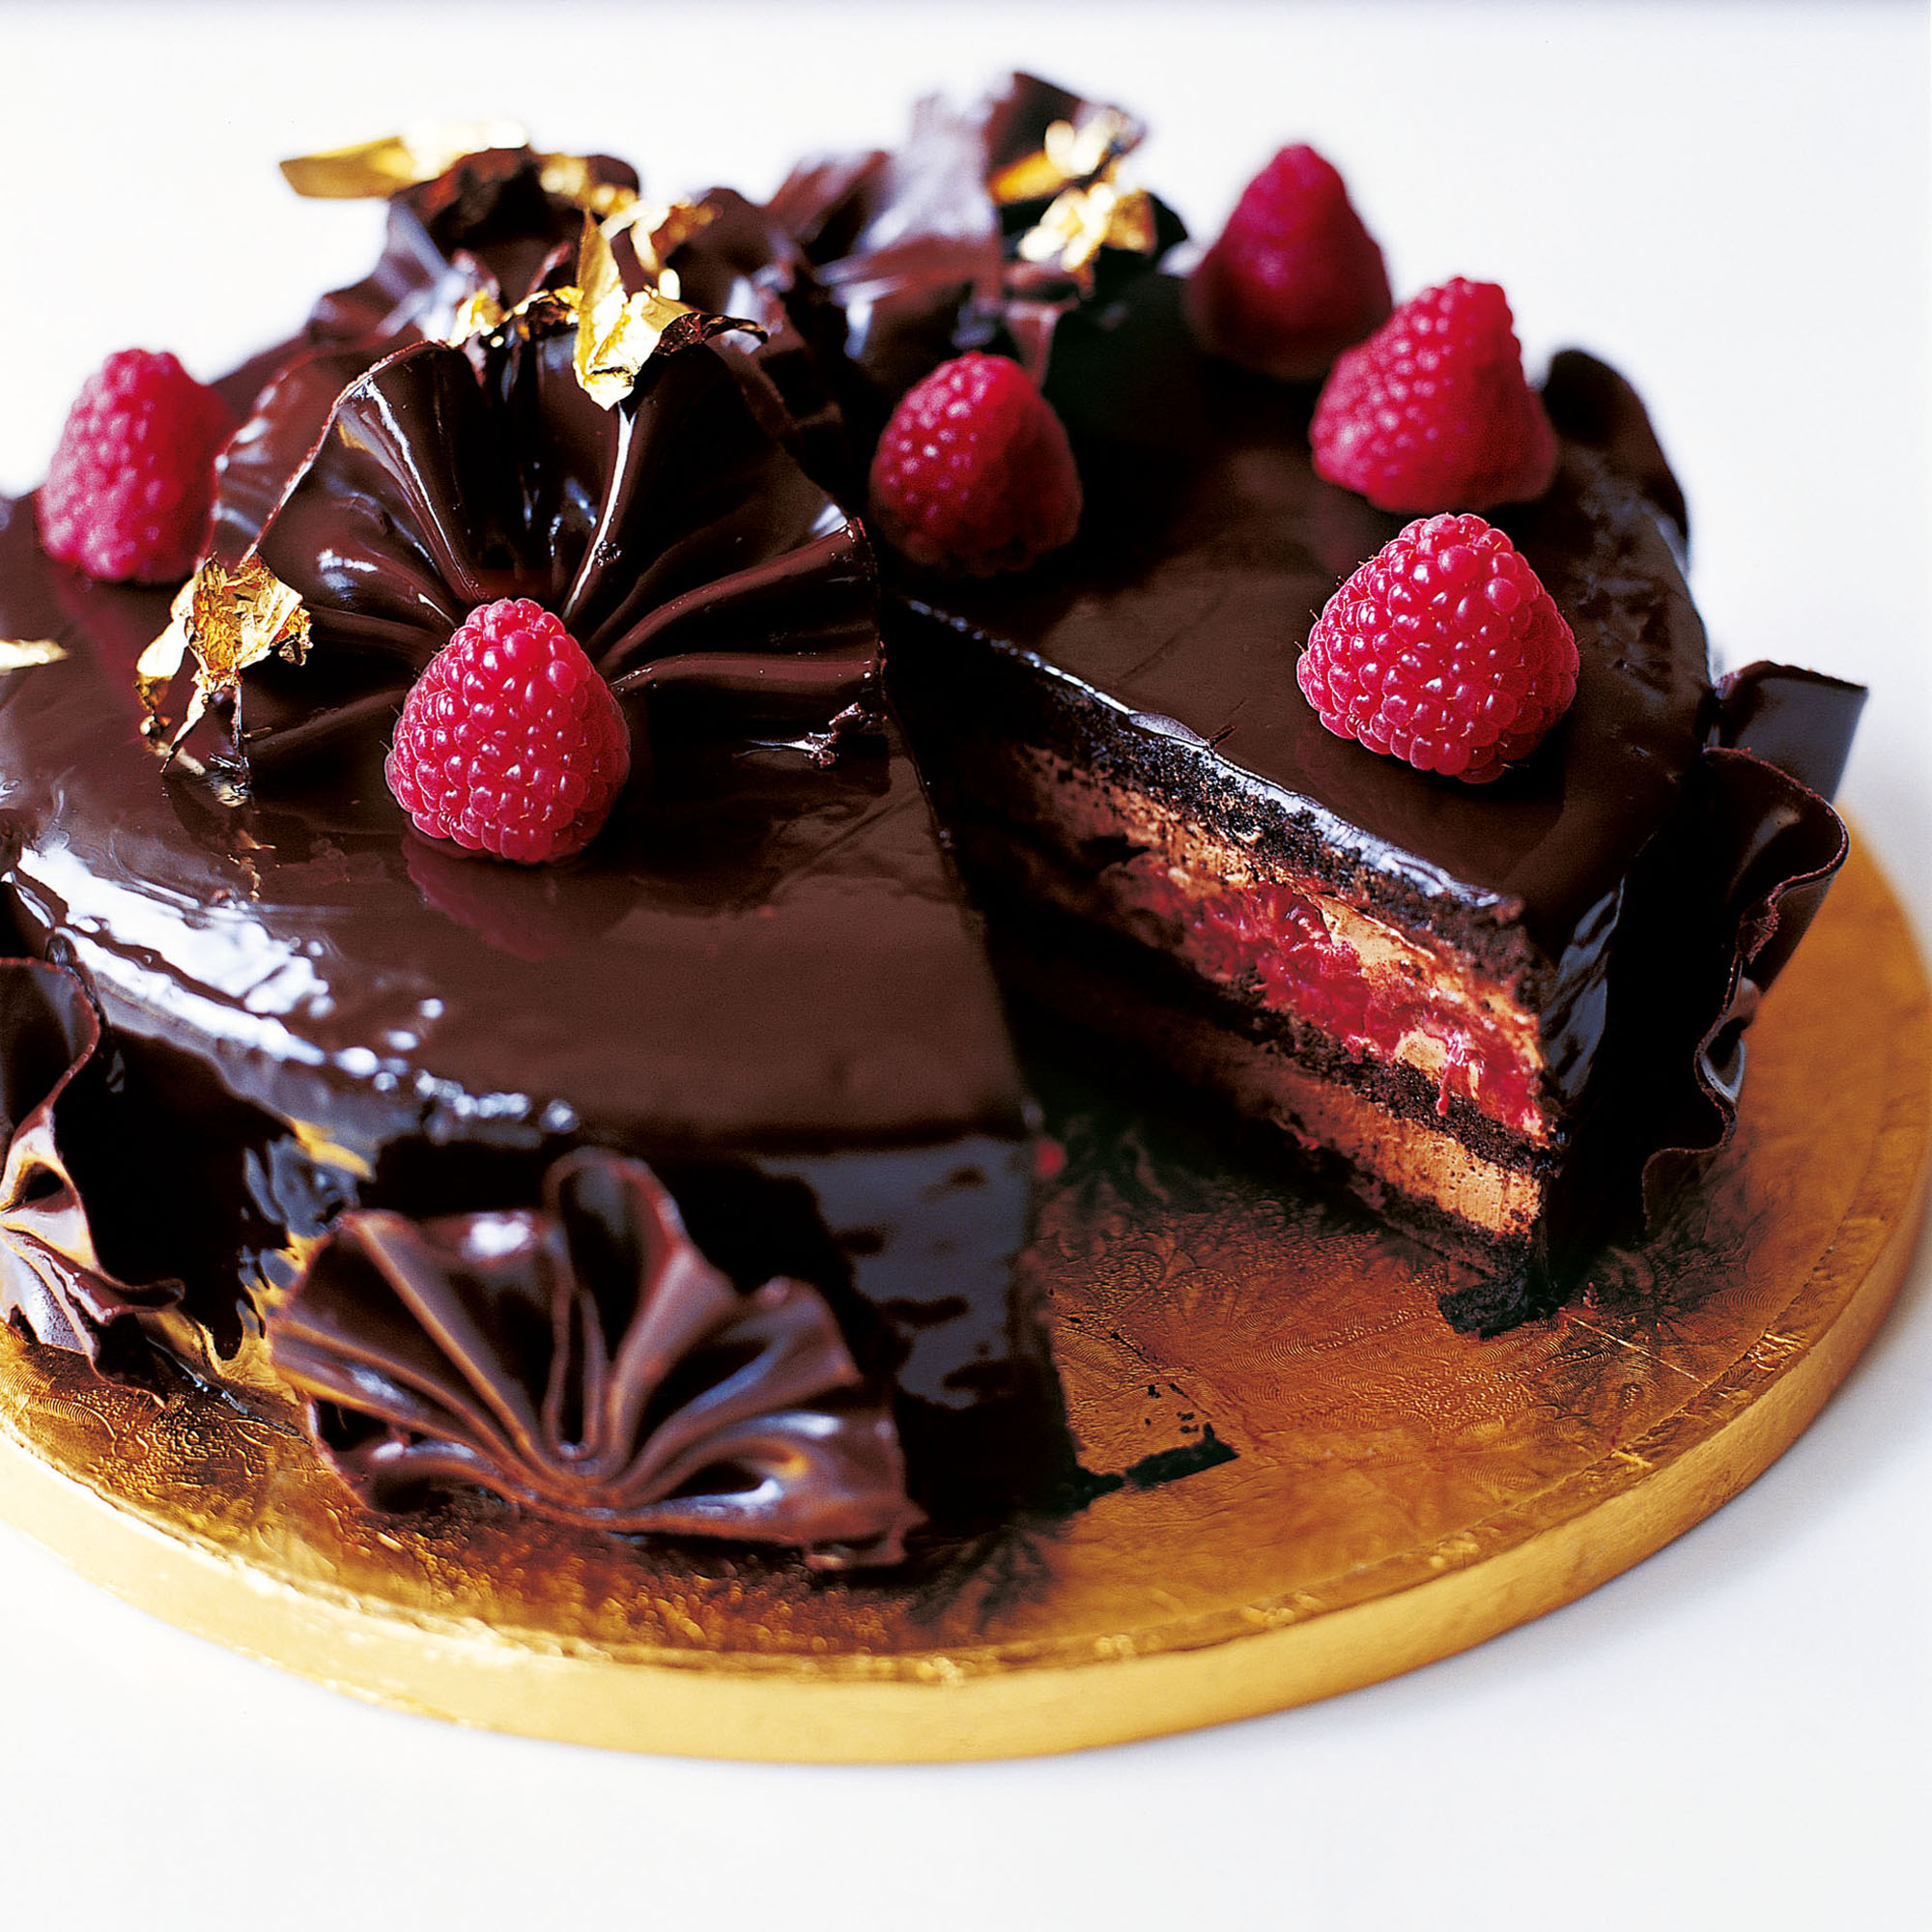 Eric Lanlard S Glamorous Chocolate Cake